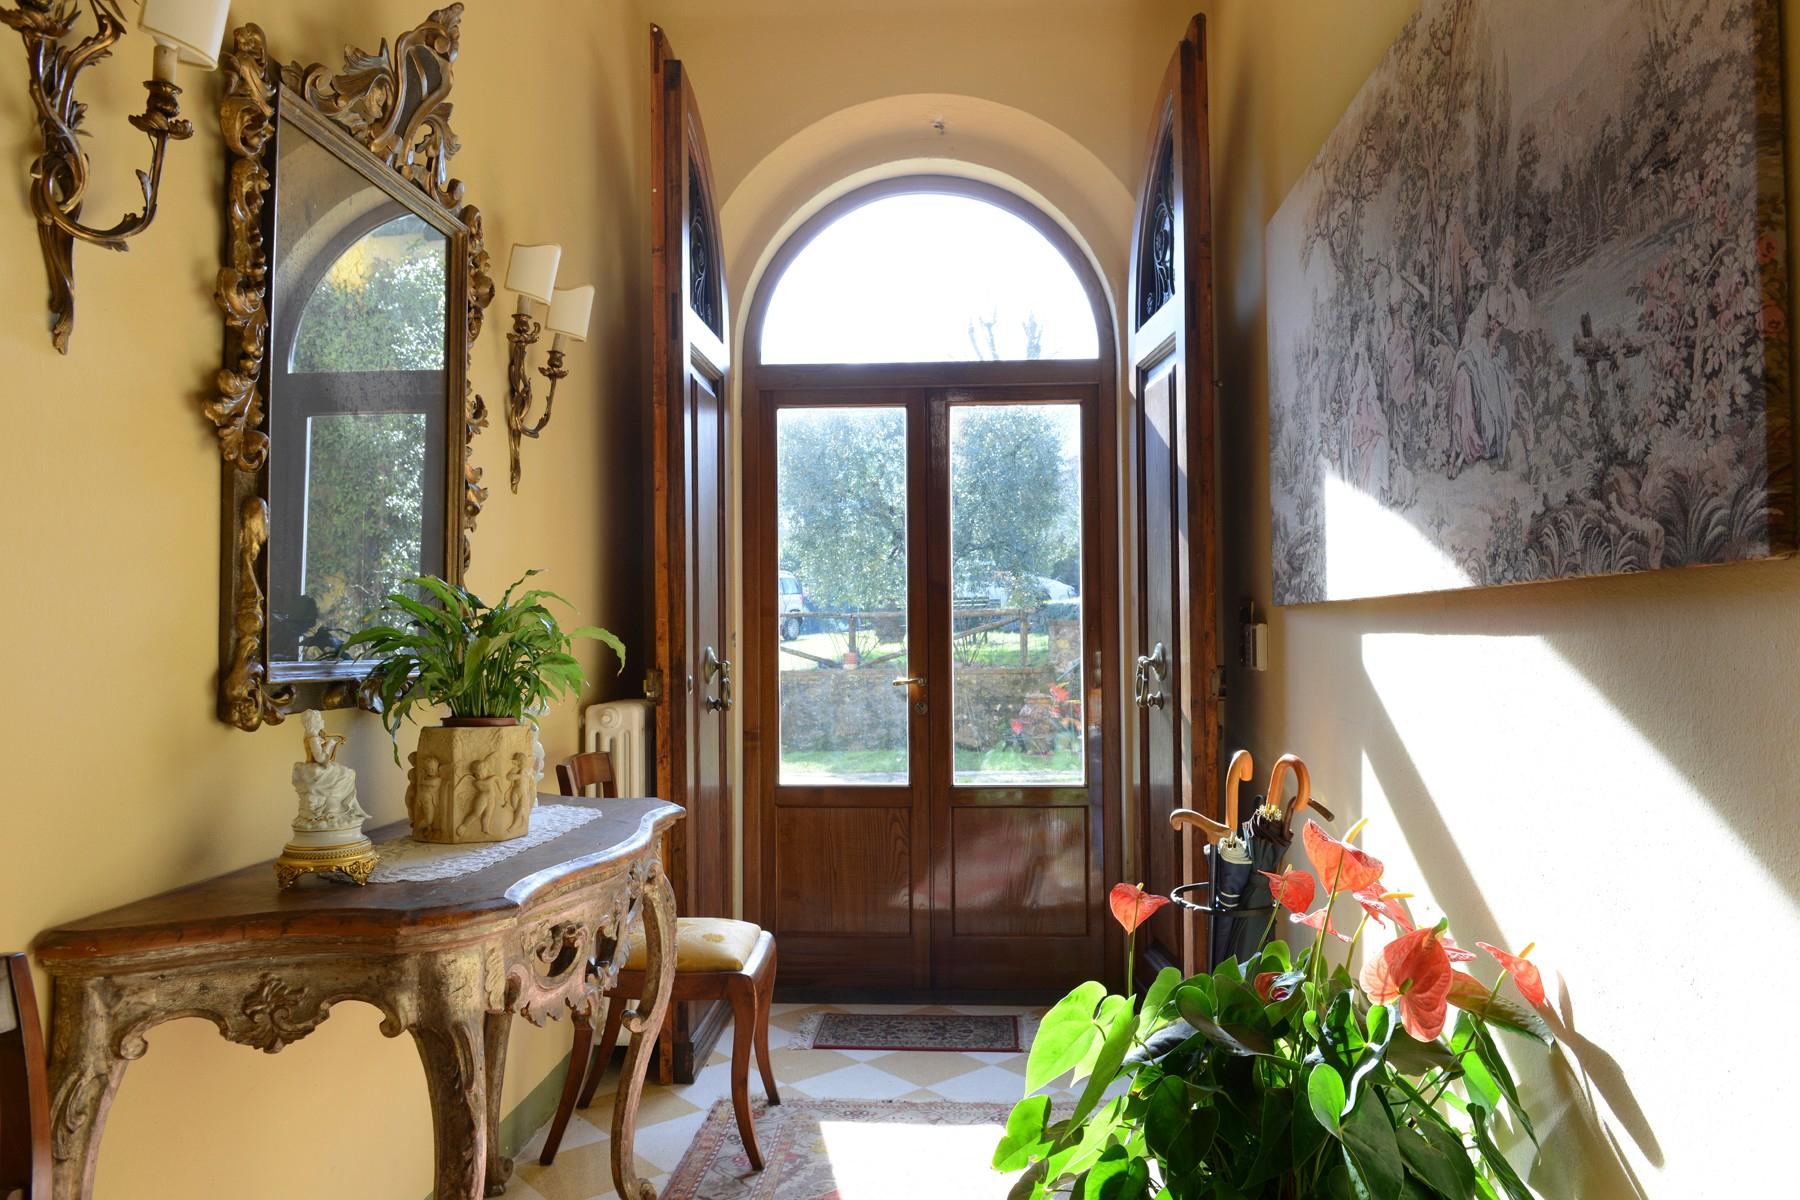 Villa in Vendita a Capannori: 5 locali, 376 mq - Foto 2